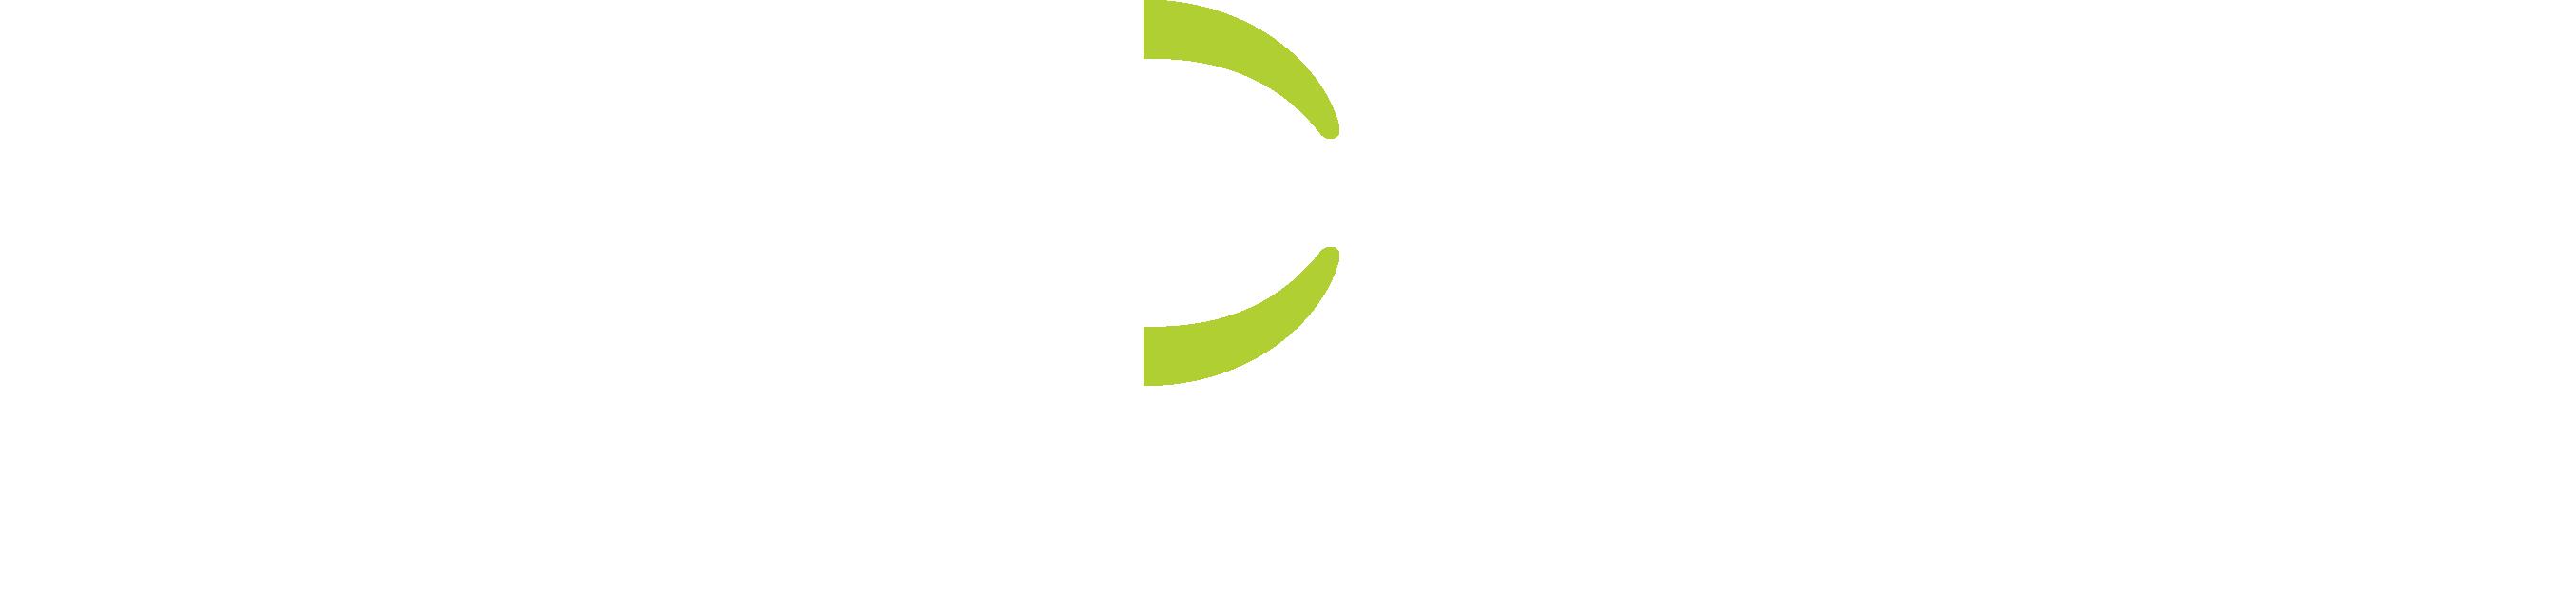 Dam, Rotterdams geld